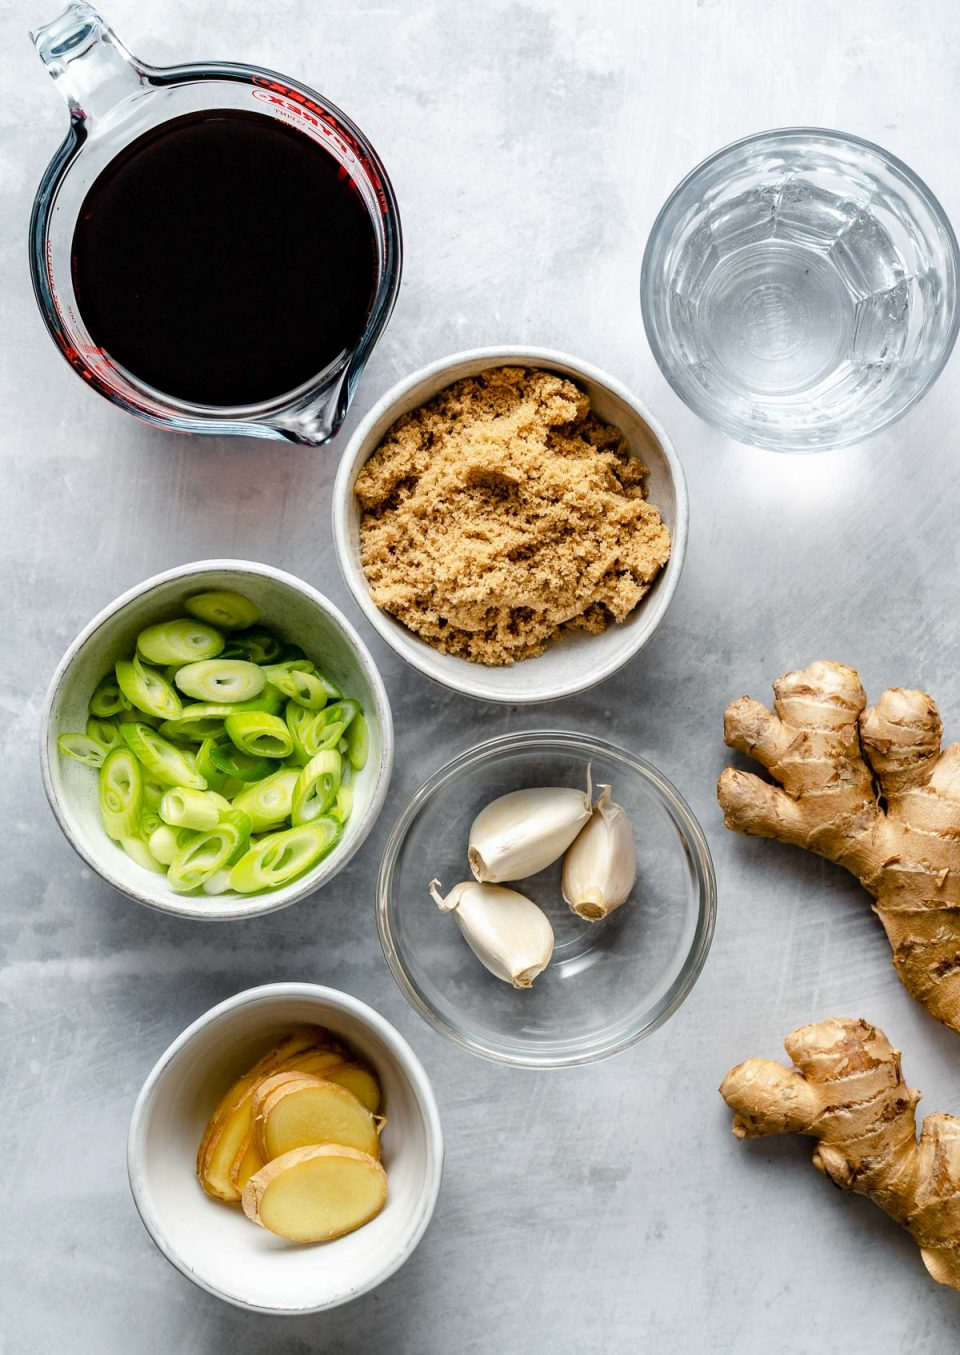 Teriyaki marinade ingredients arranged on a light blue surface: soy sauce, water, brown sugar, garlic, green onions, & fresh ginger.